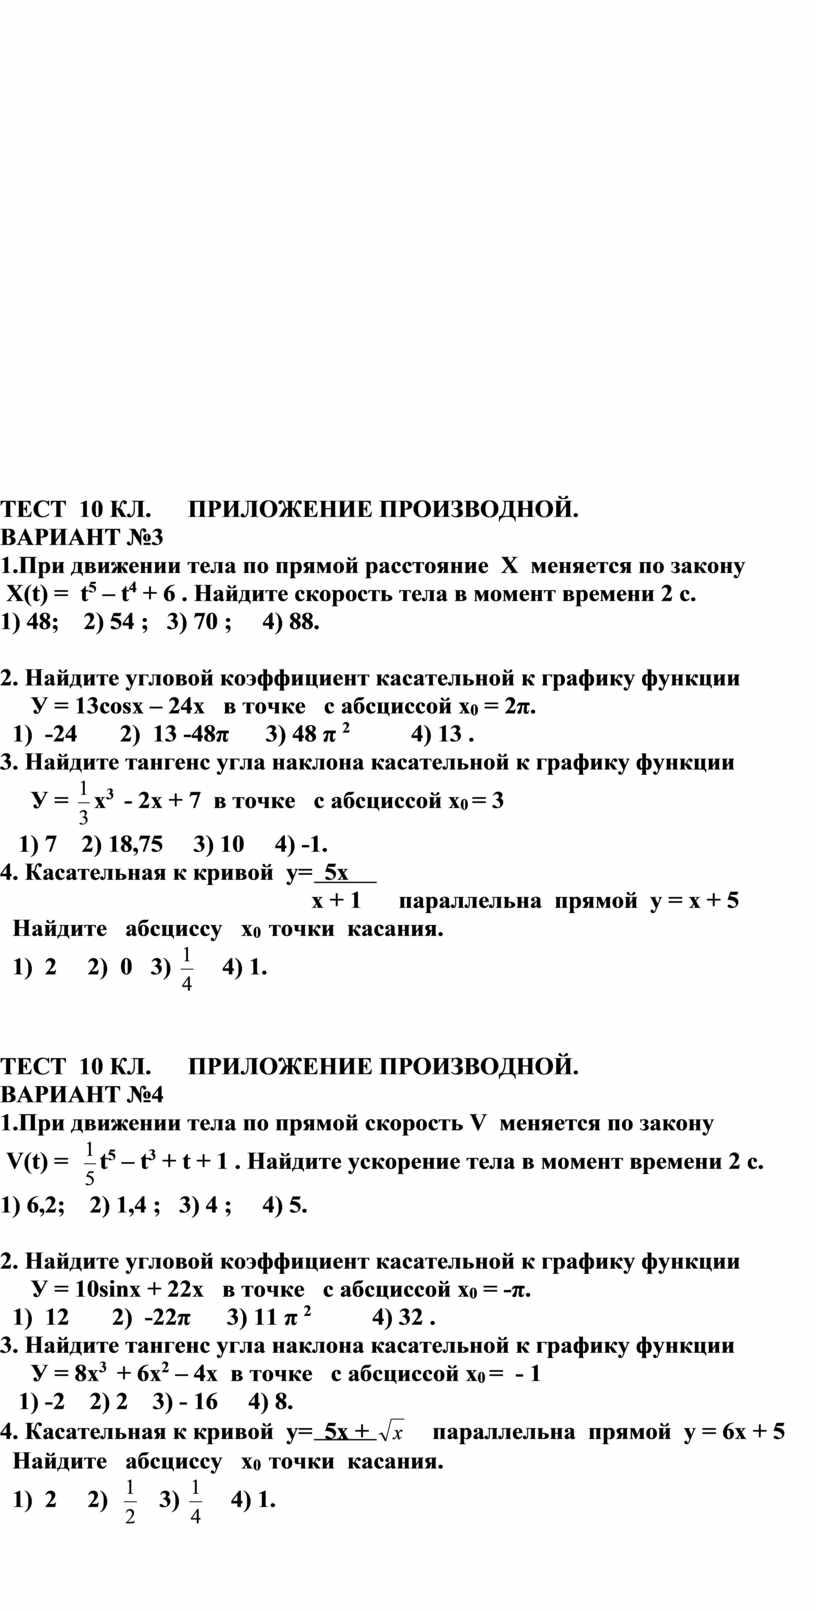 ТЕСТ 10 КЛ. ПРИЛОЖЕНИЕ